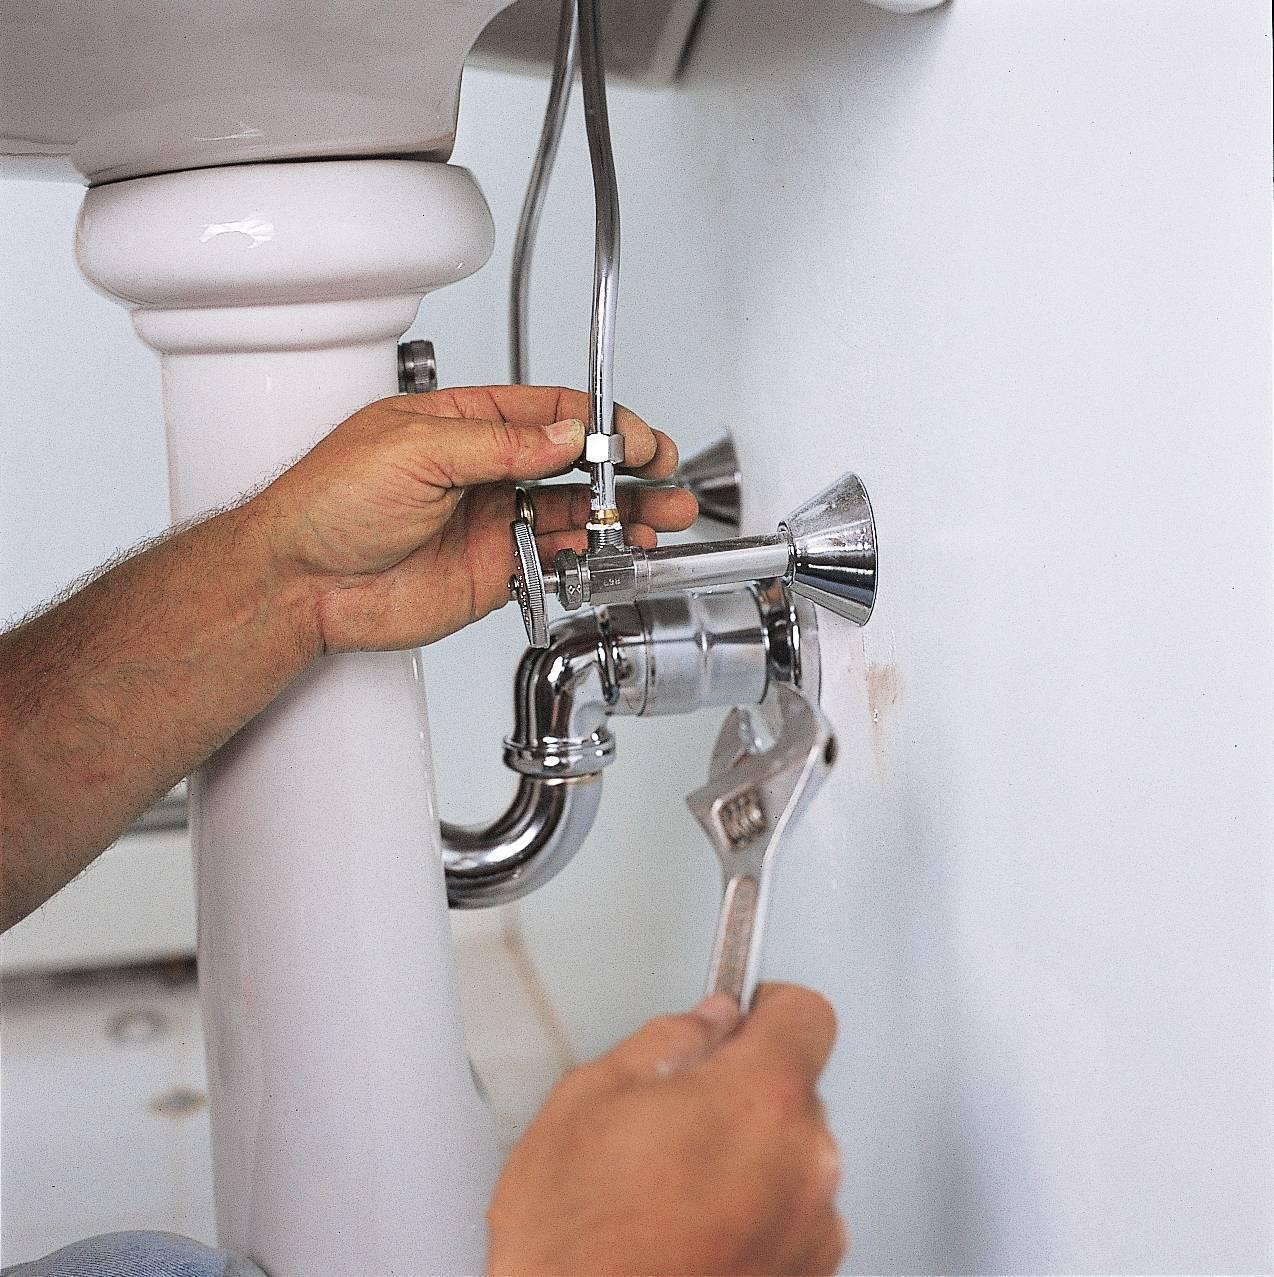 Установка сантехники в ванной комнате, видео, разводка своими руками